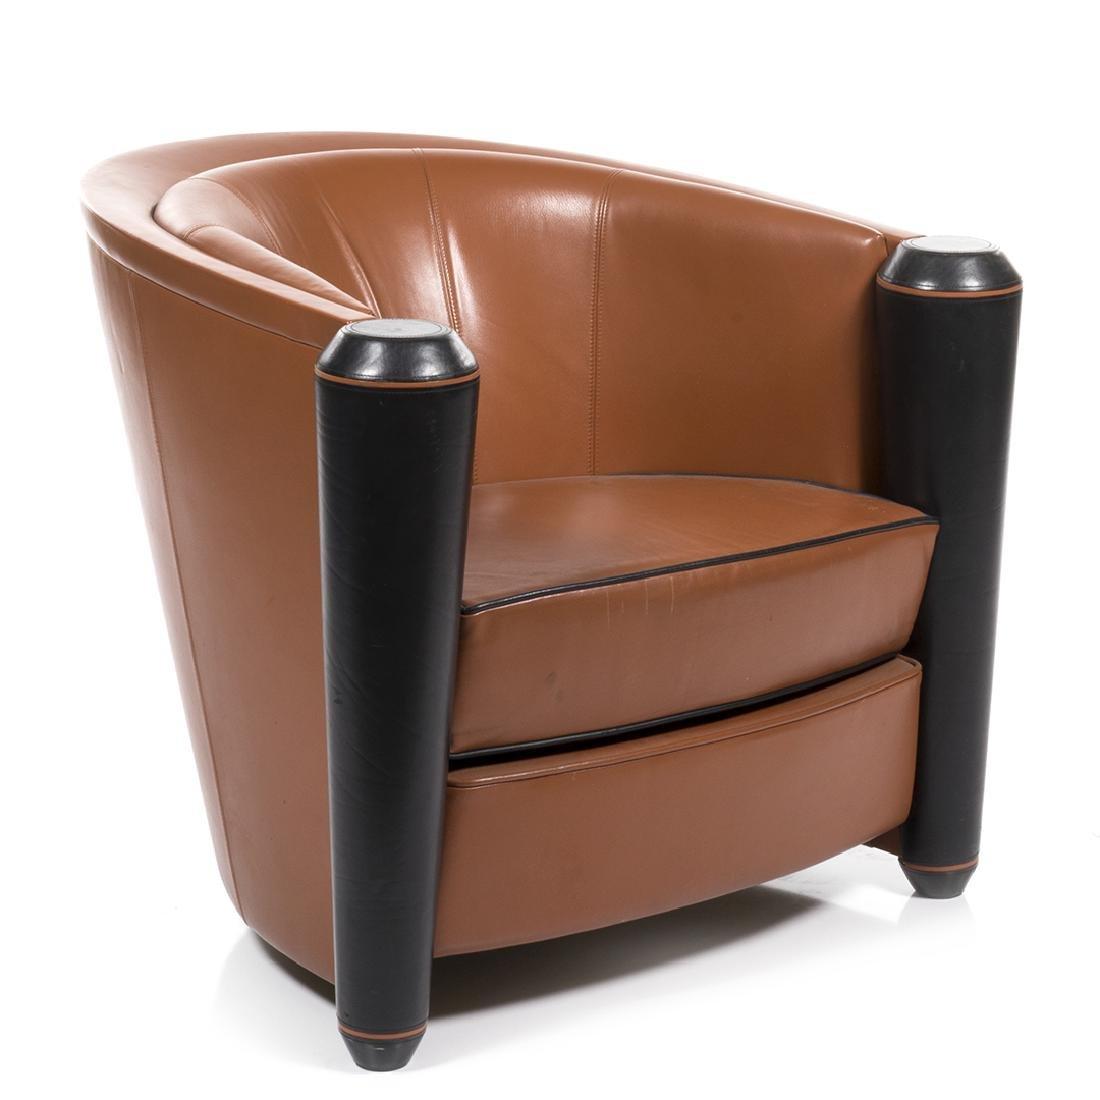 Adam Tihany Club Chair